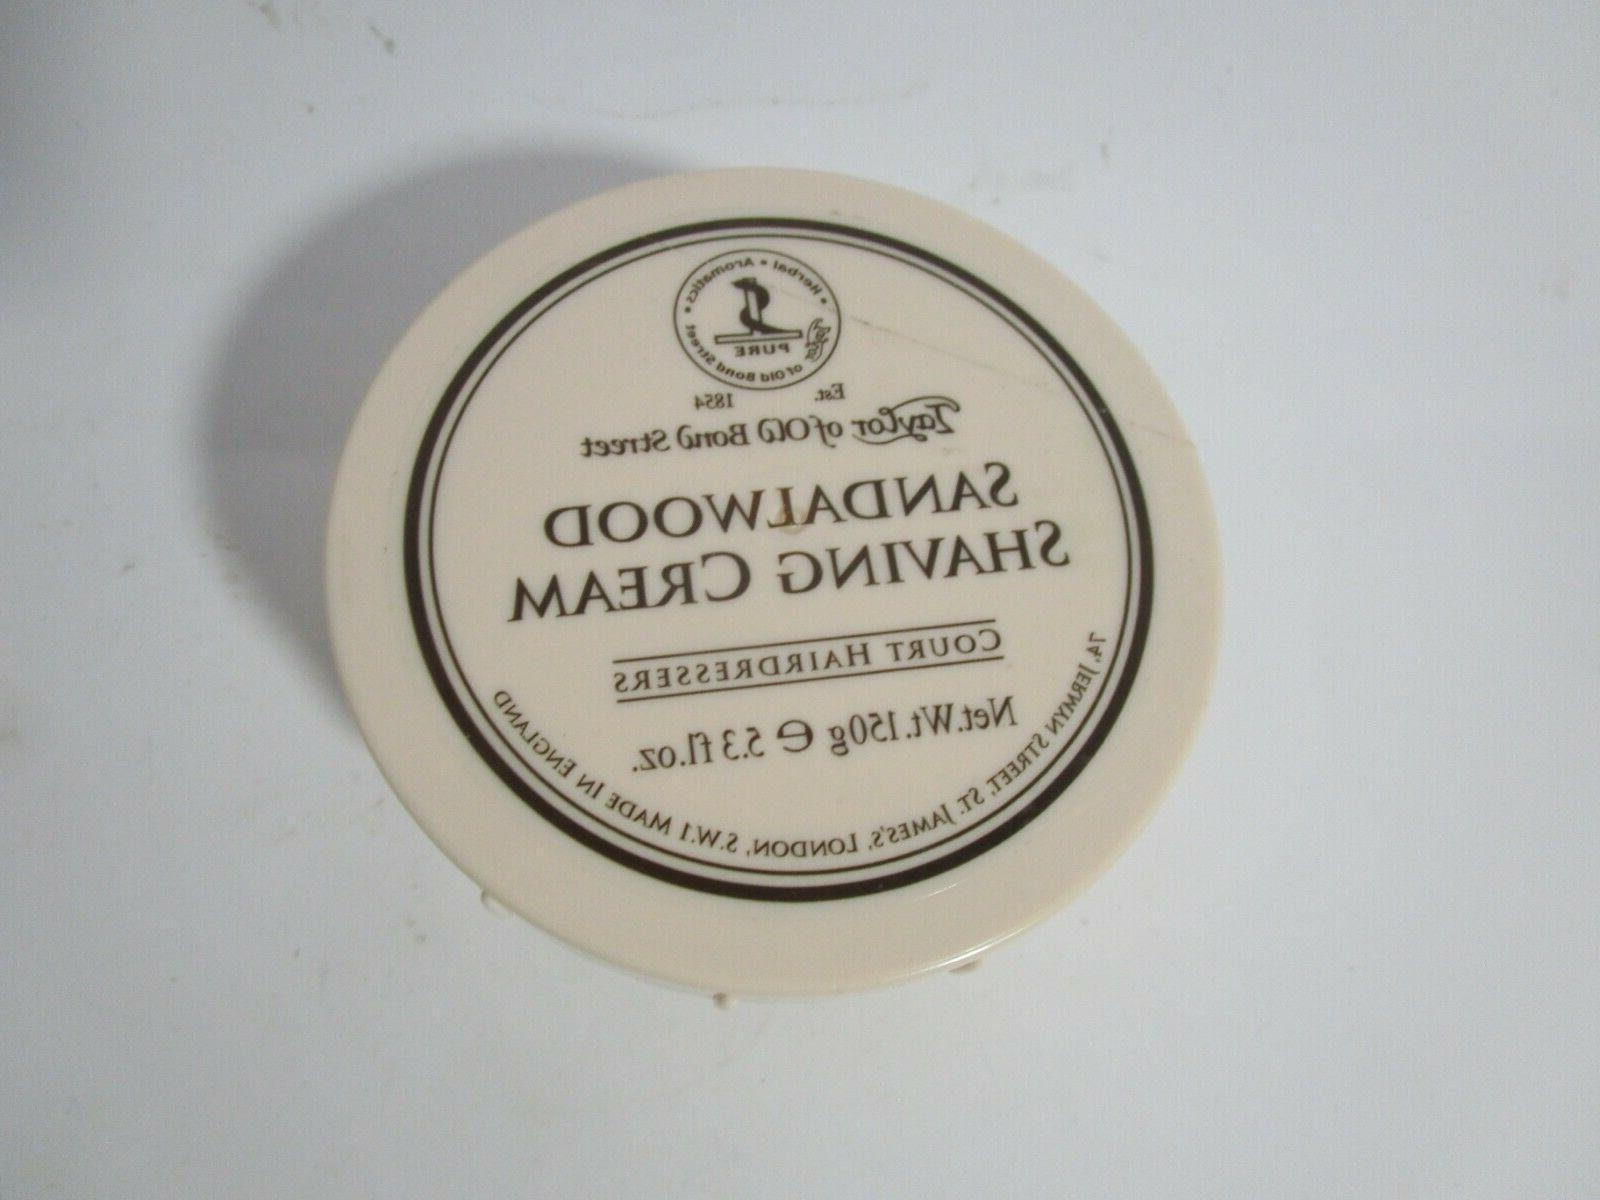 sandalwood shaving cream bowl 5 3 oz